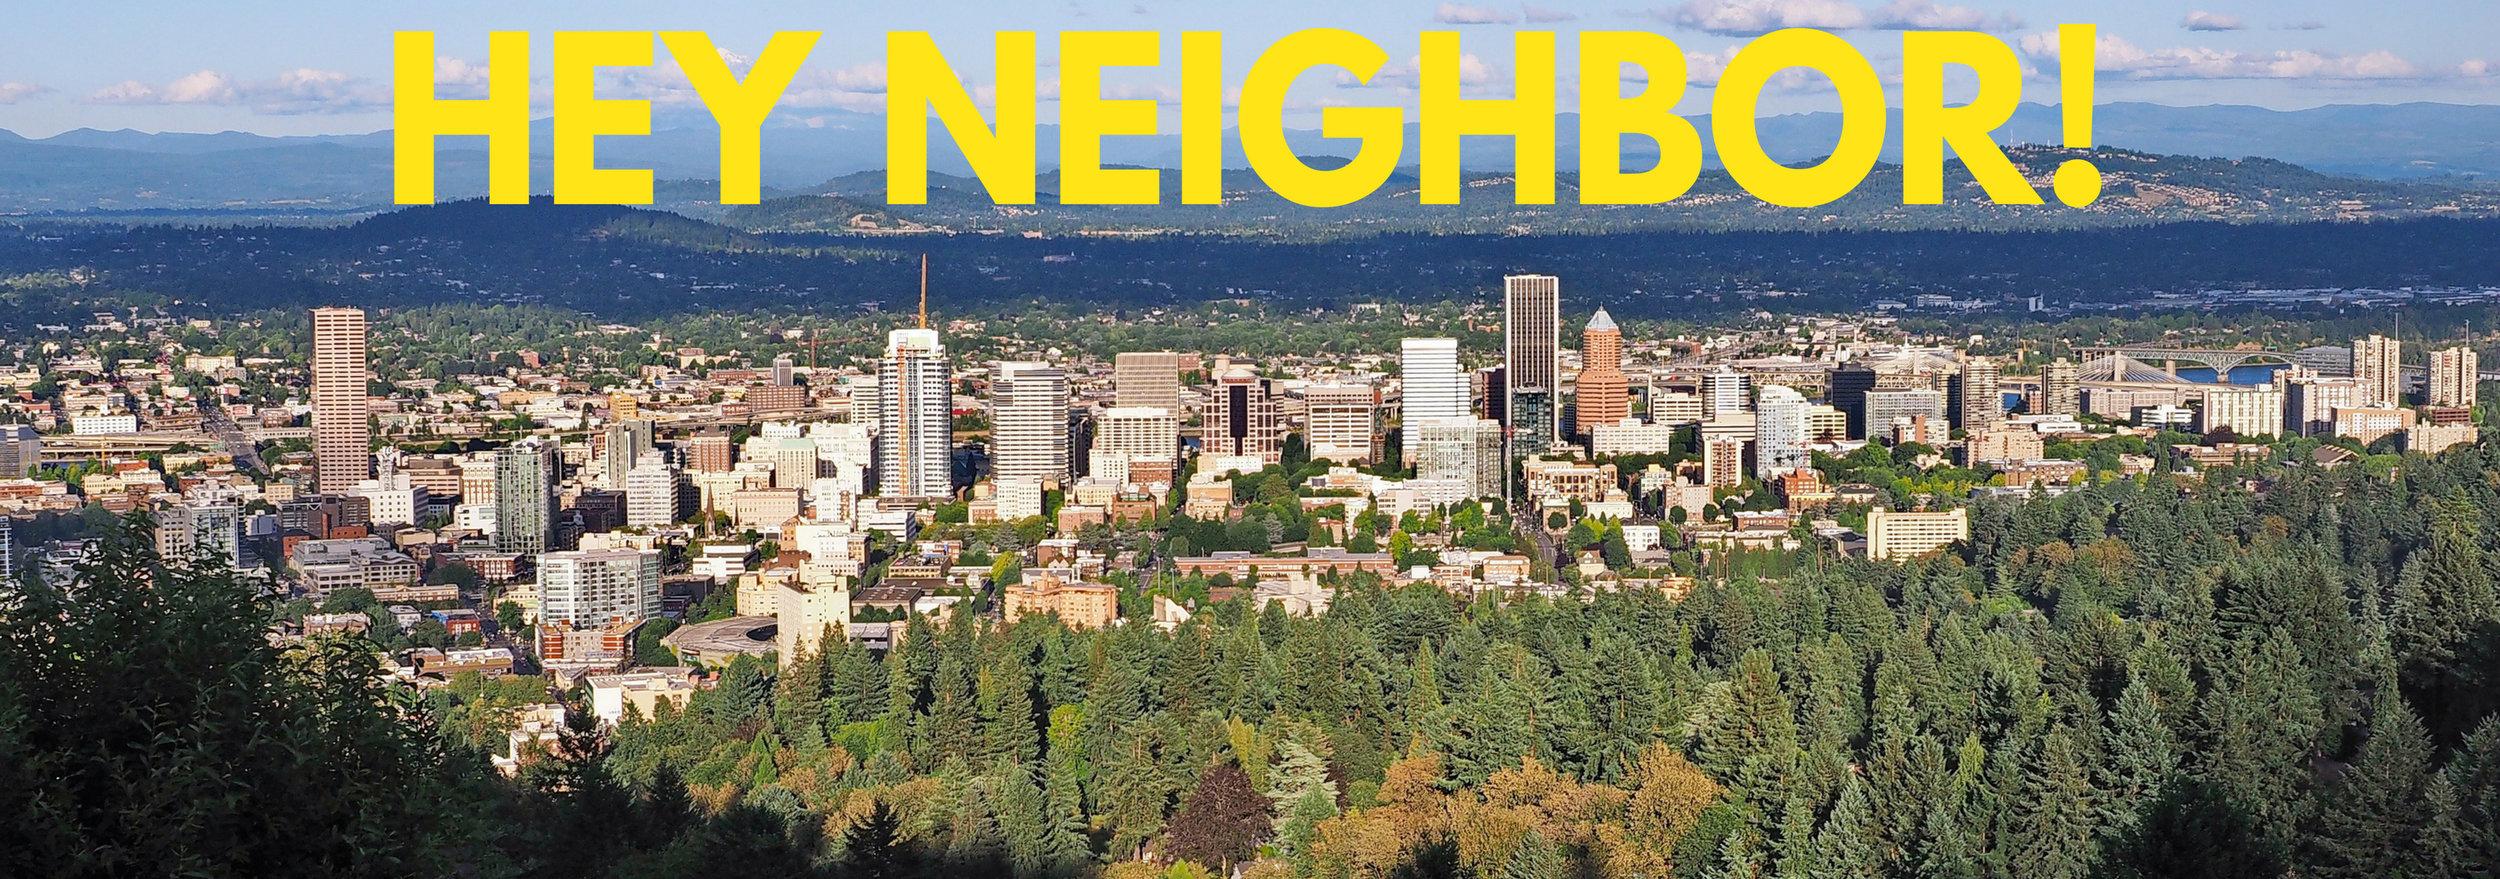 hey neighbor!.jpg